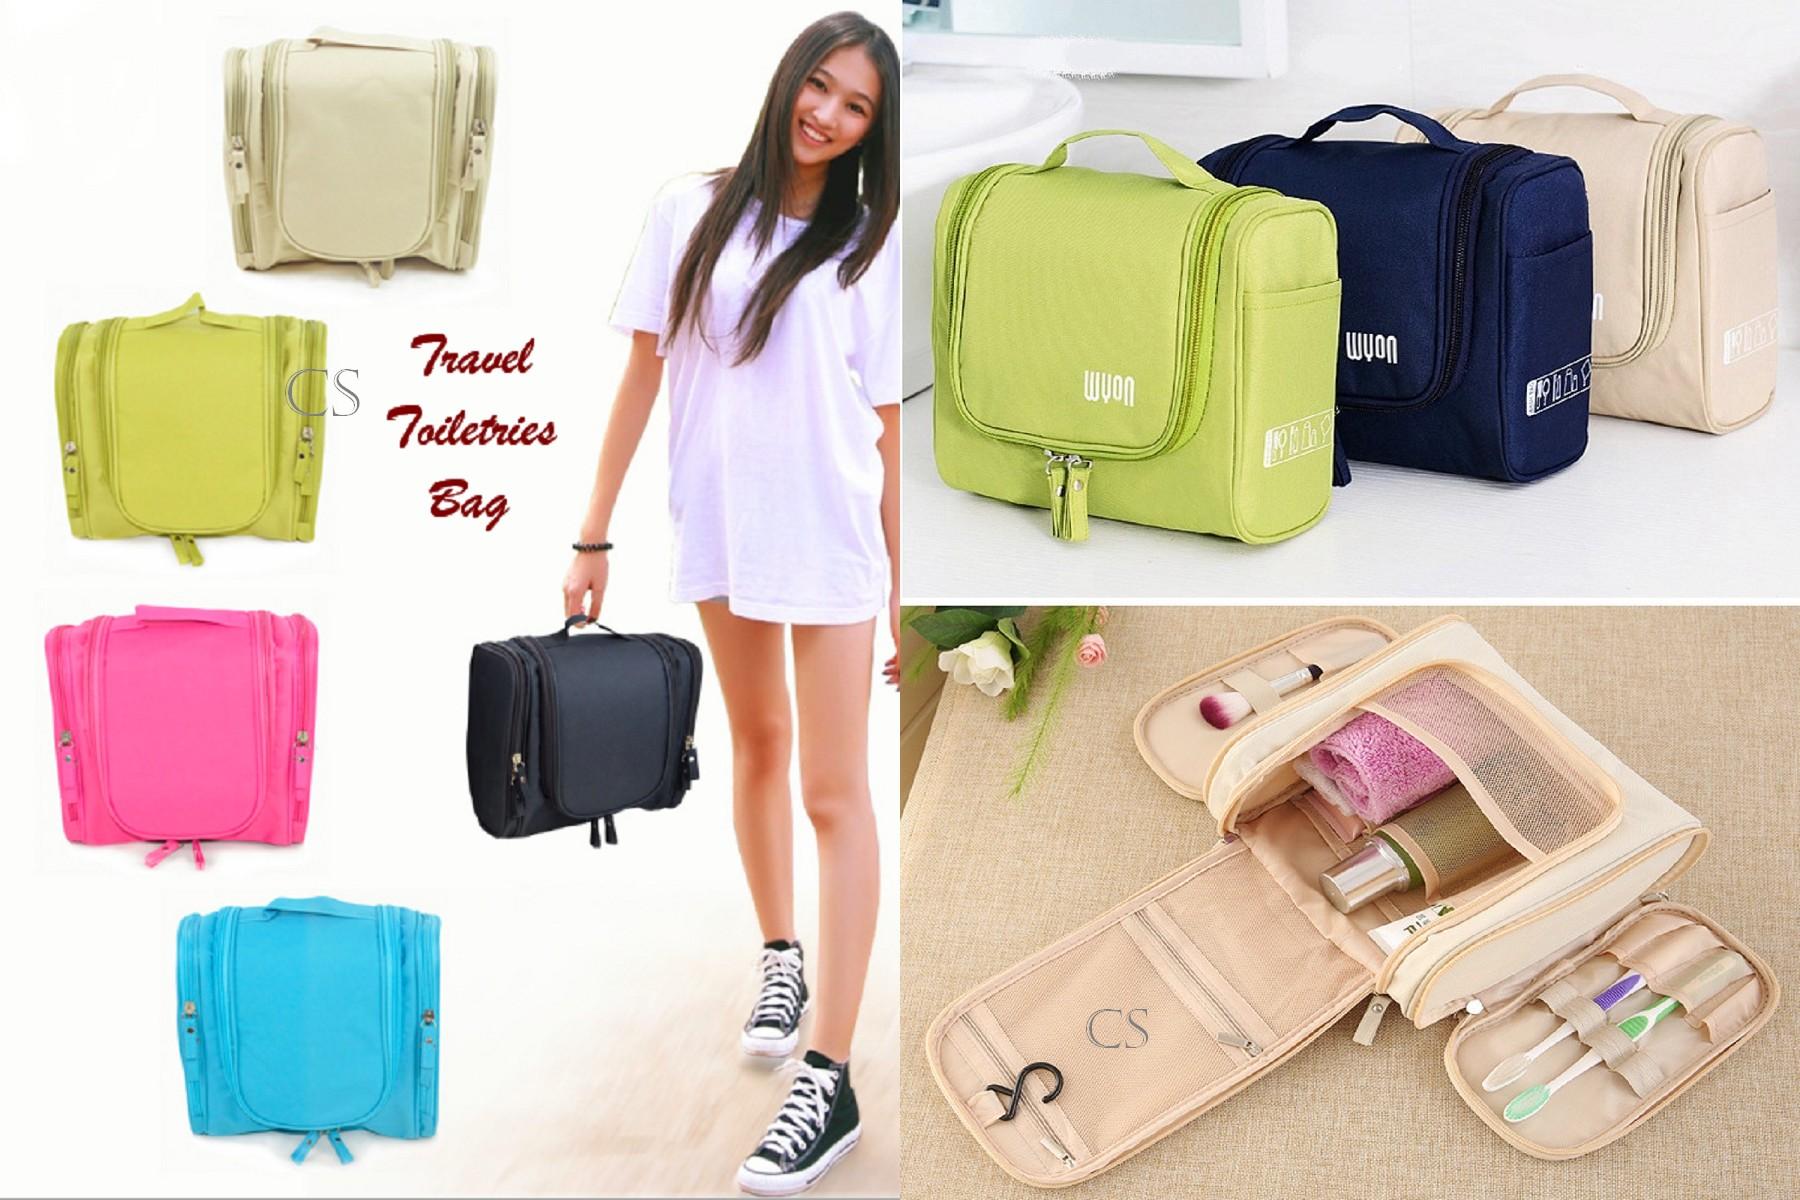 ... Jual Travel Toiletries Bag Tas untuk tempat kosmetik & perlengkapan mandi riiyanshop Tokopedia